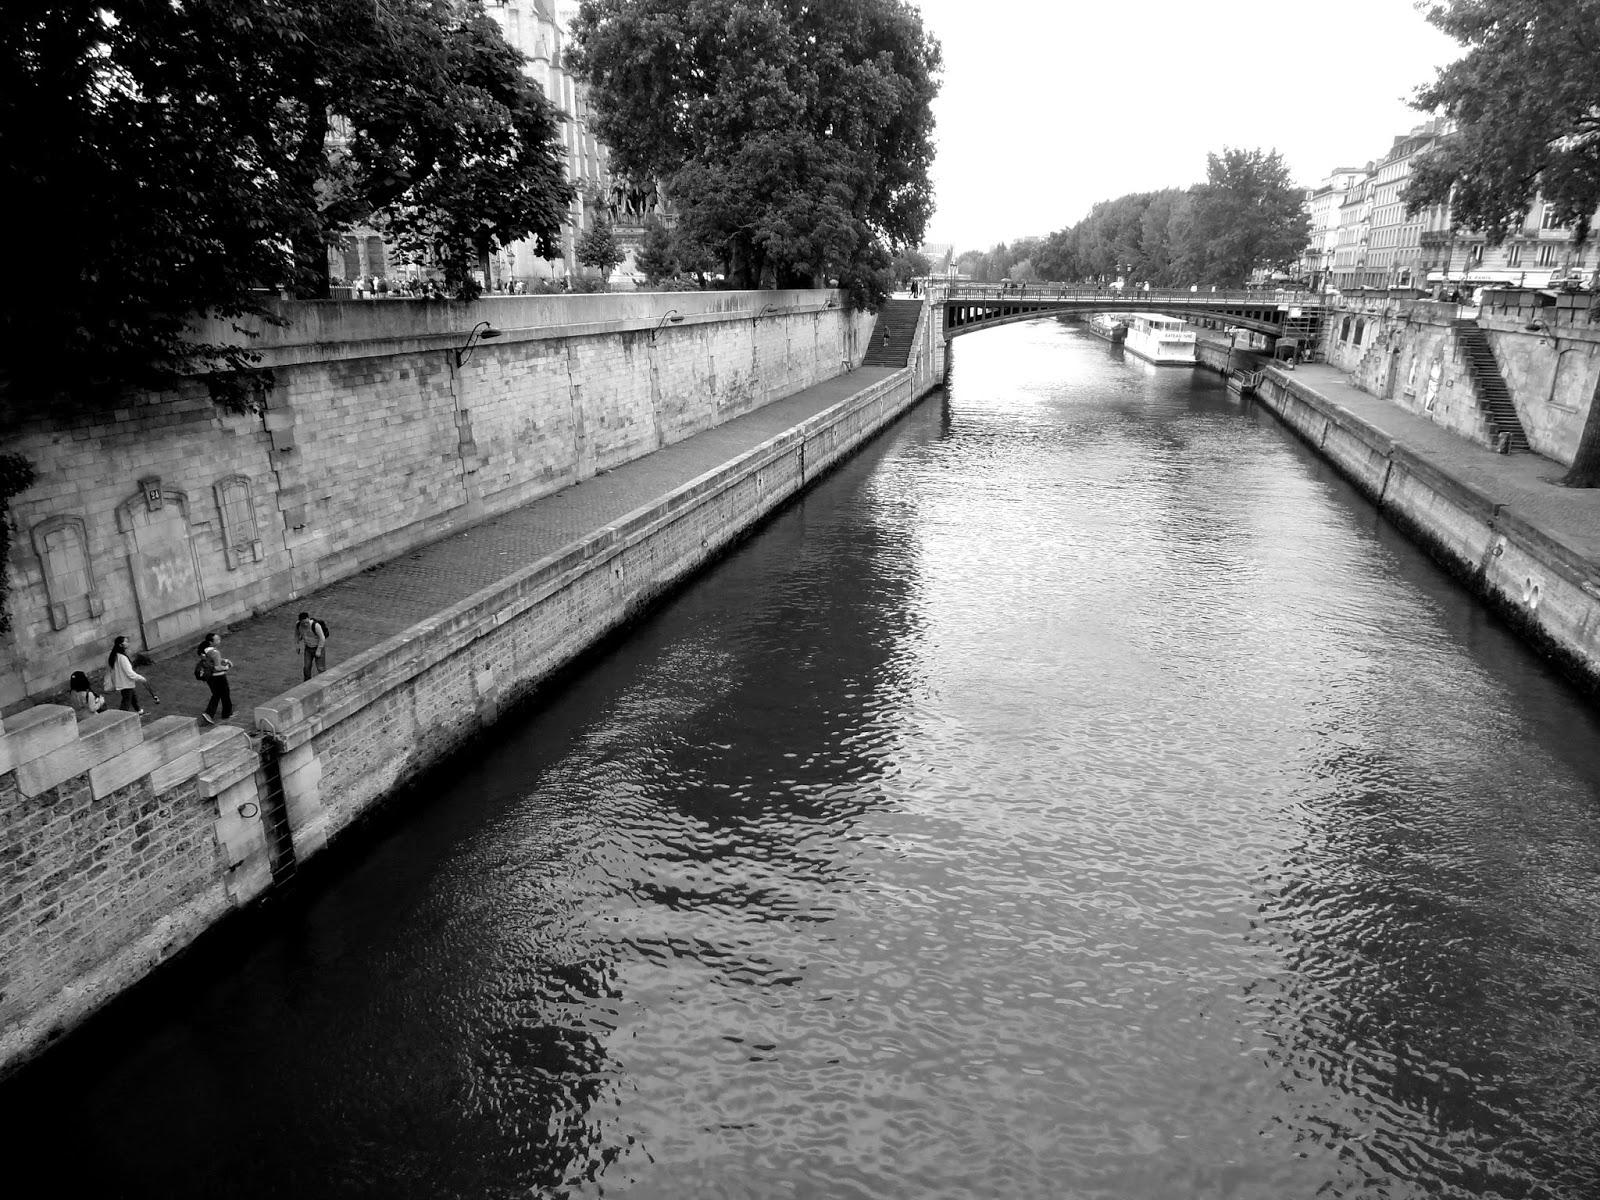 http://pinceedesel.blogspot.fr/2014/07/il-est-cinq-heures.html